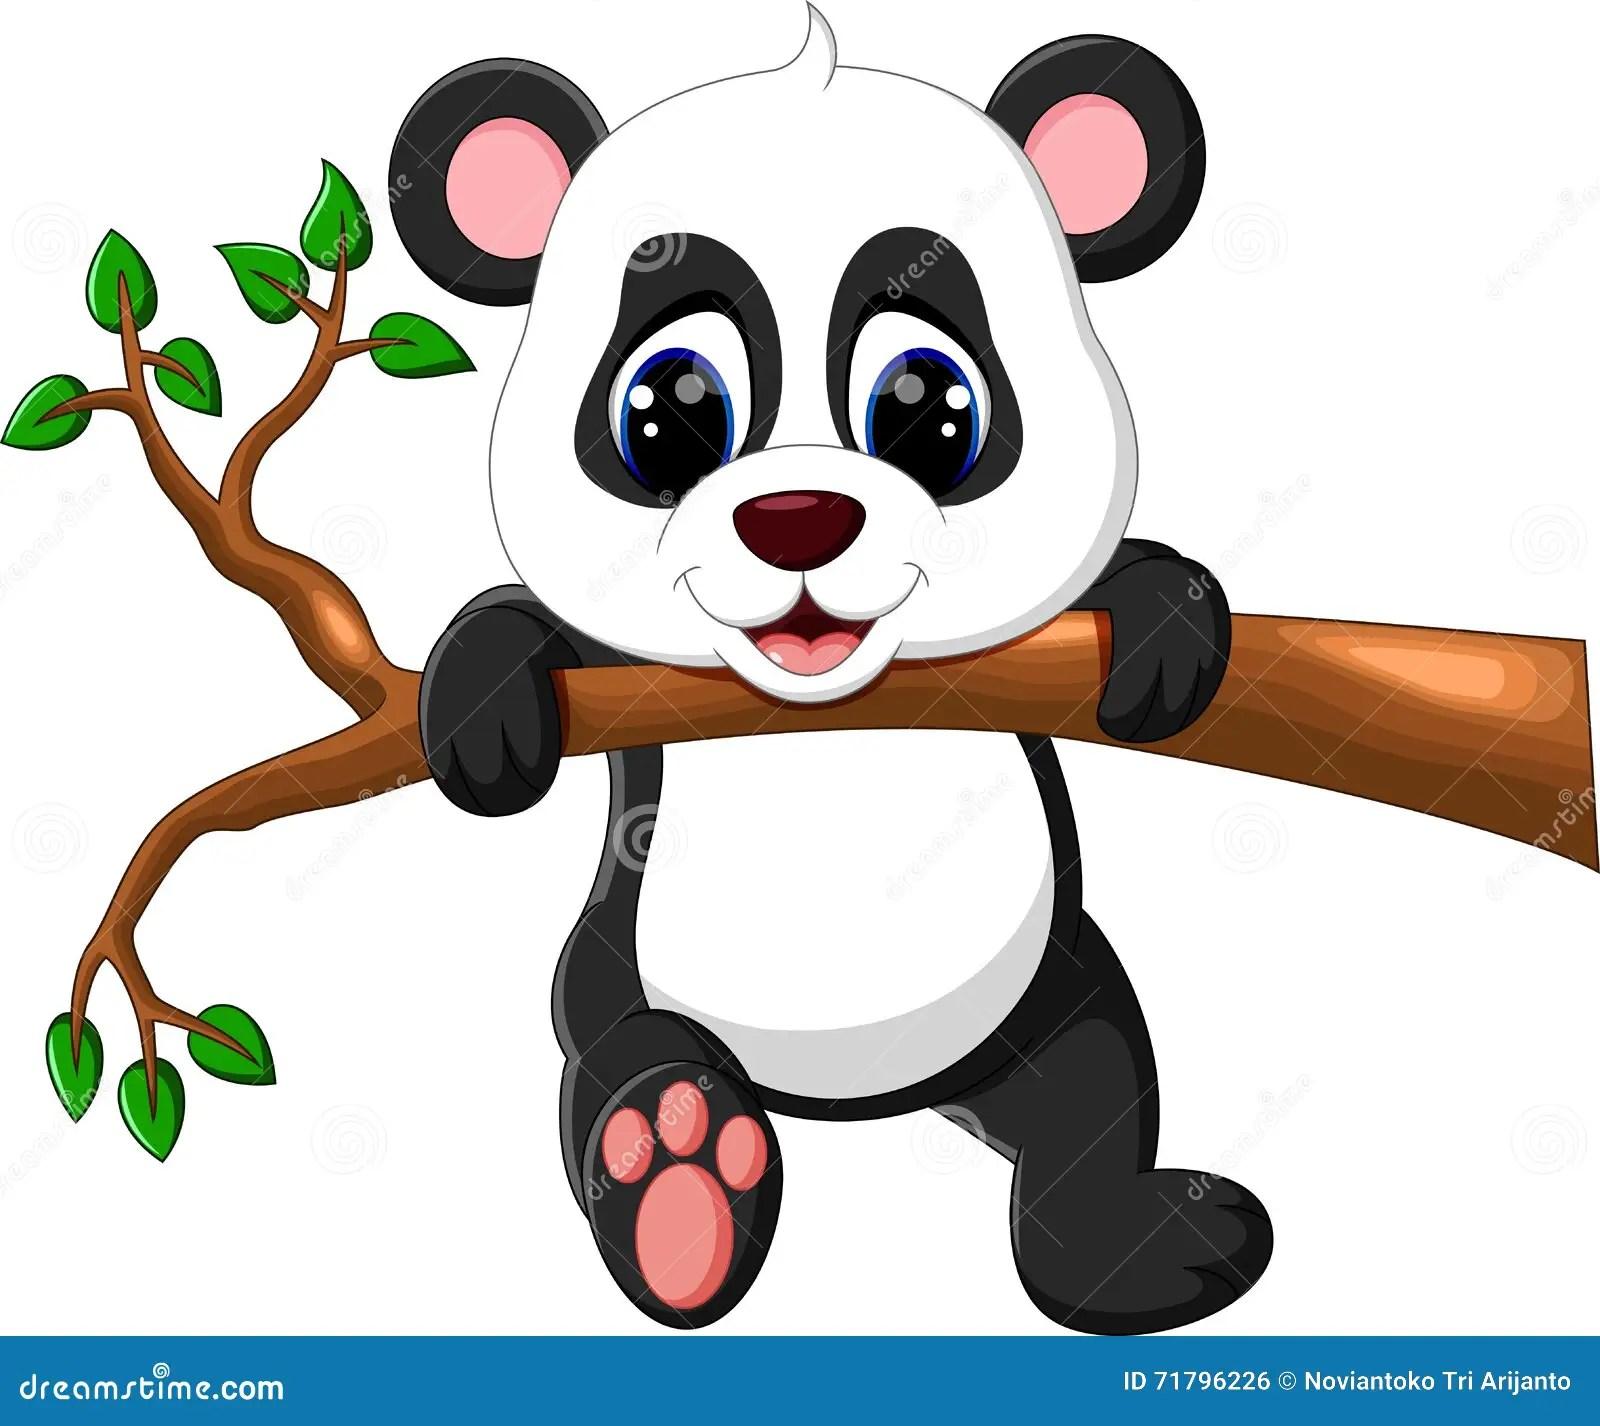 Cute Baby Panda Cartoon Vector Illustration